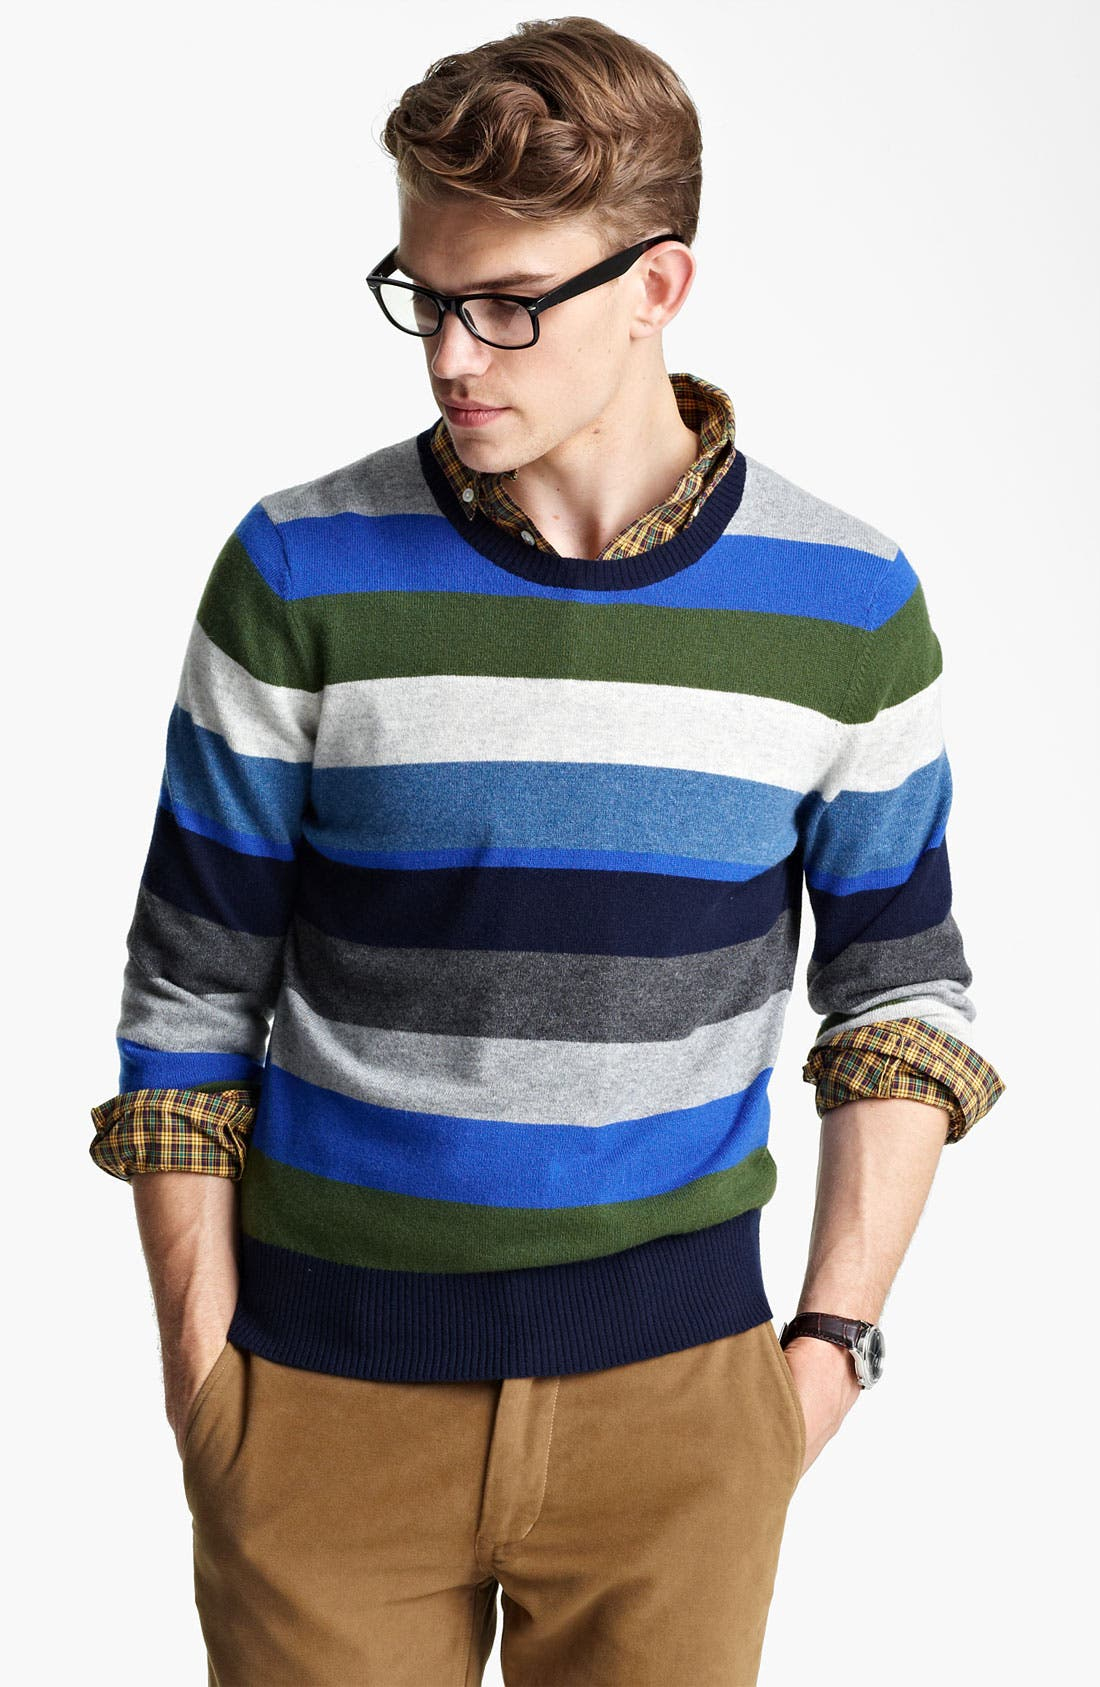 Main Image - Jack Spade 'Page' Stripe Wool & Cashmere Sweater